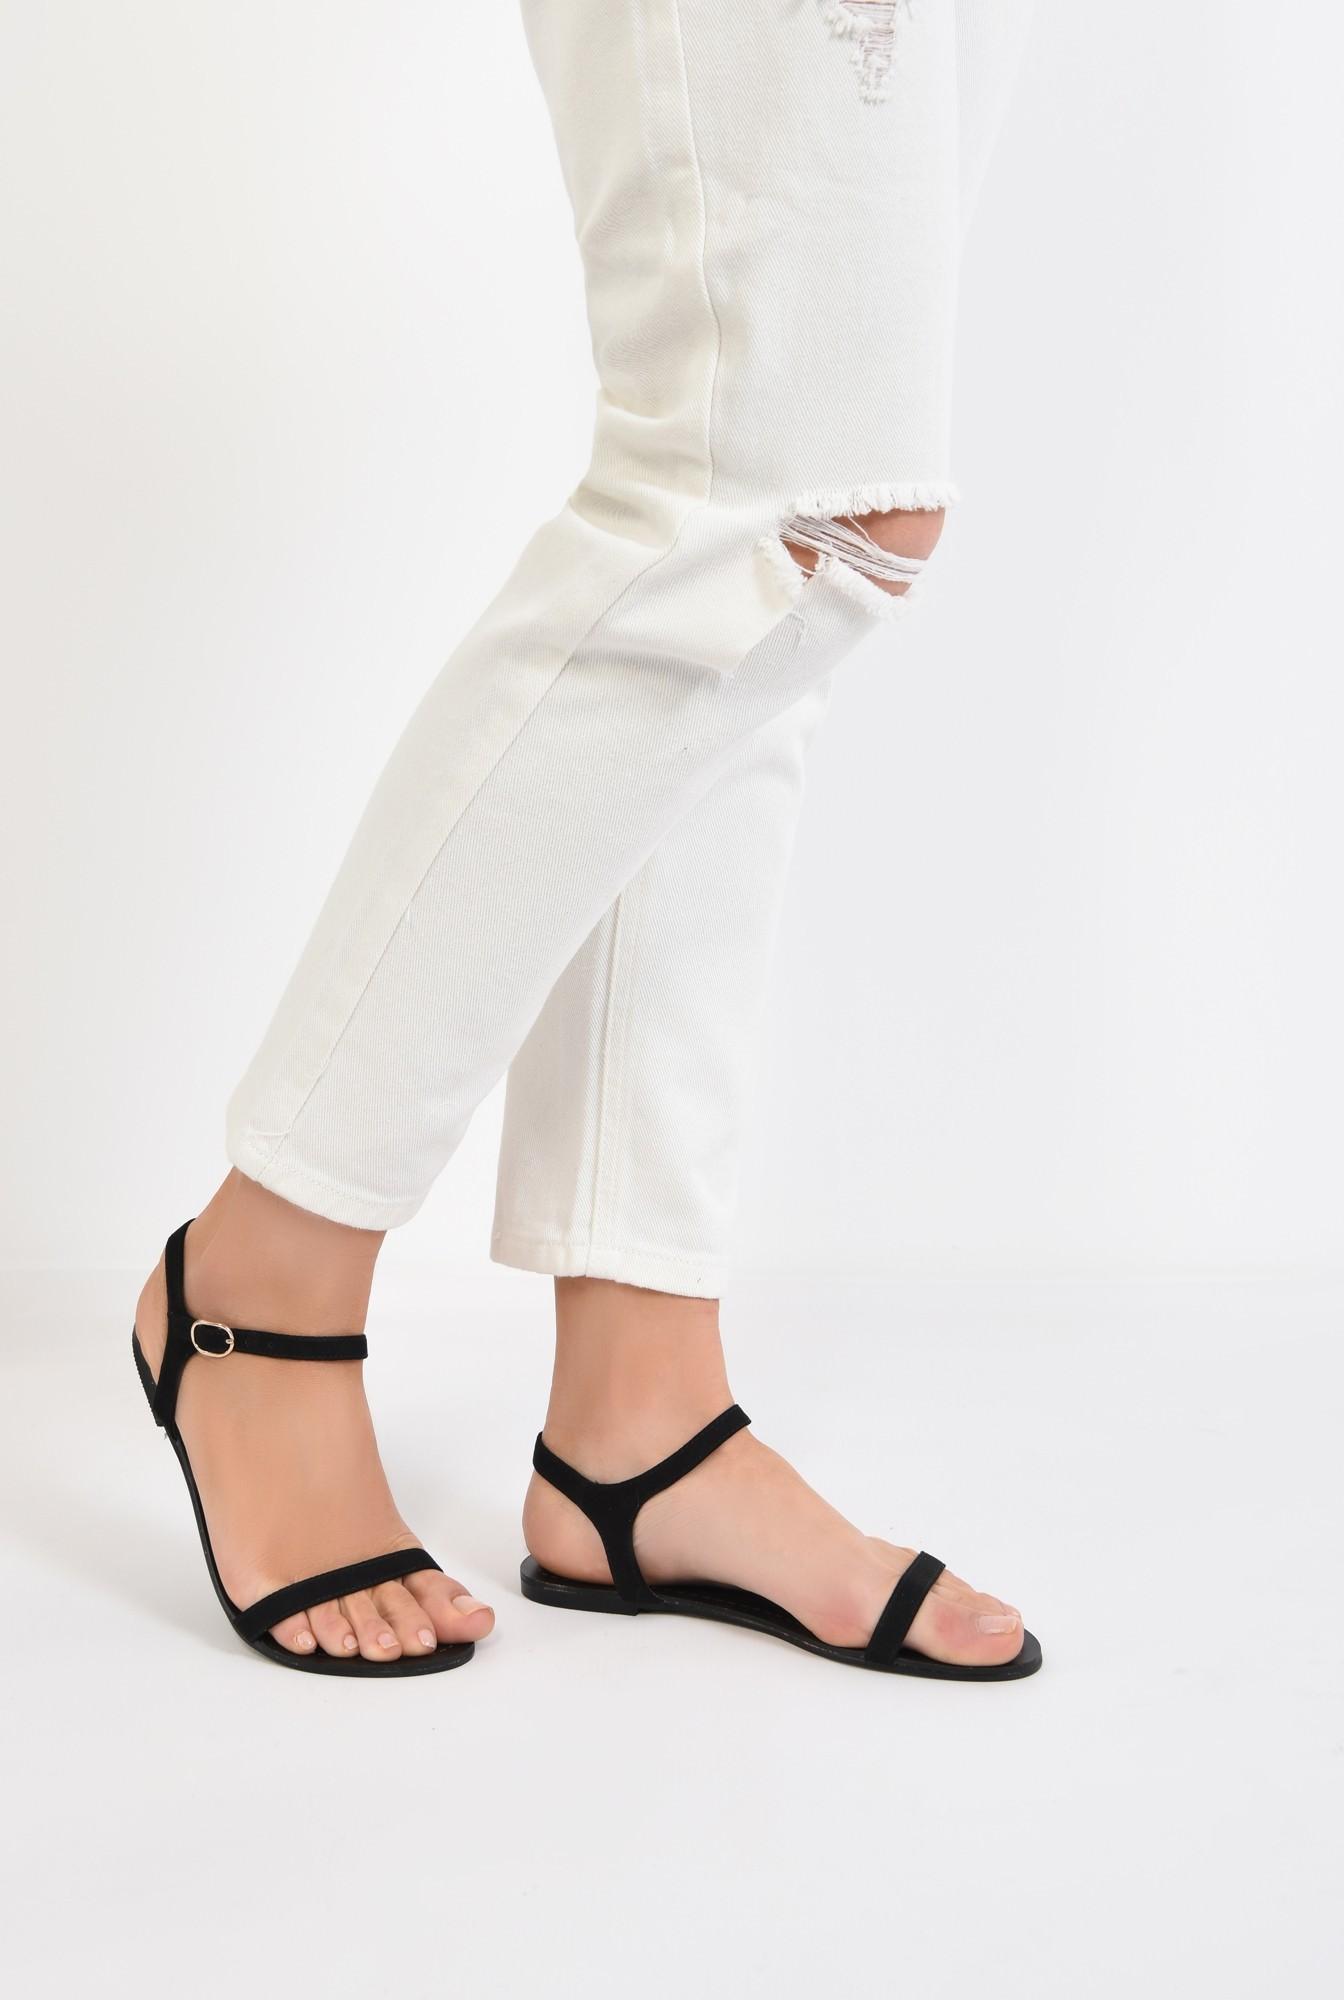 4 - sandale casual, negre, din velur, fara toc